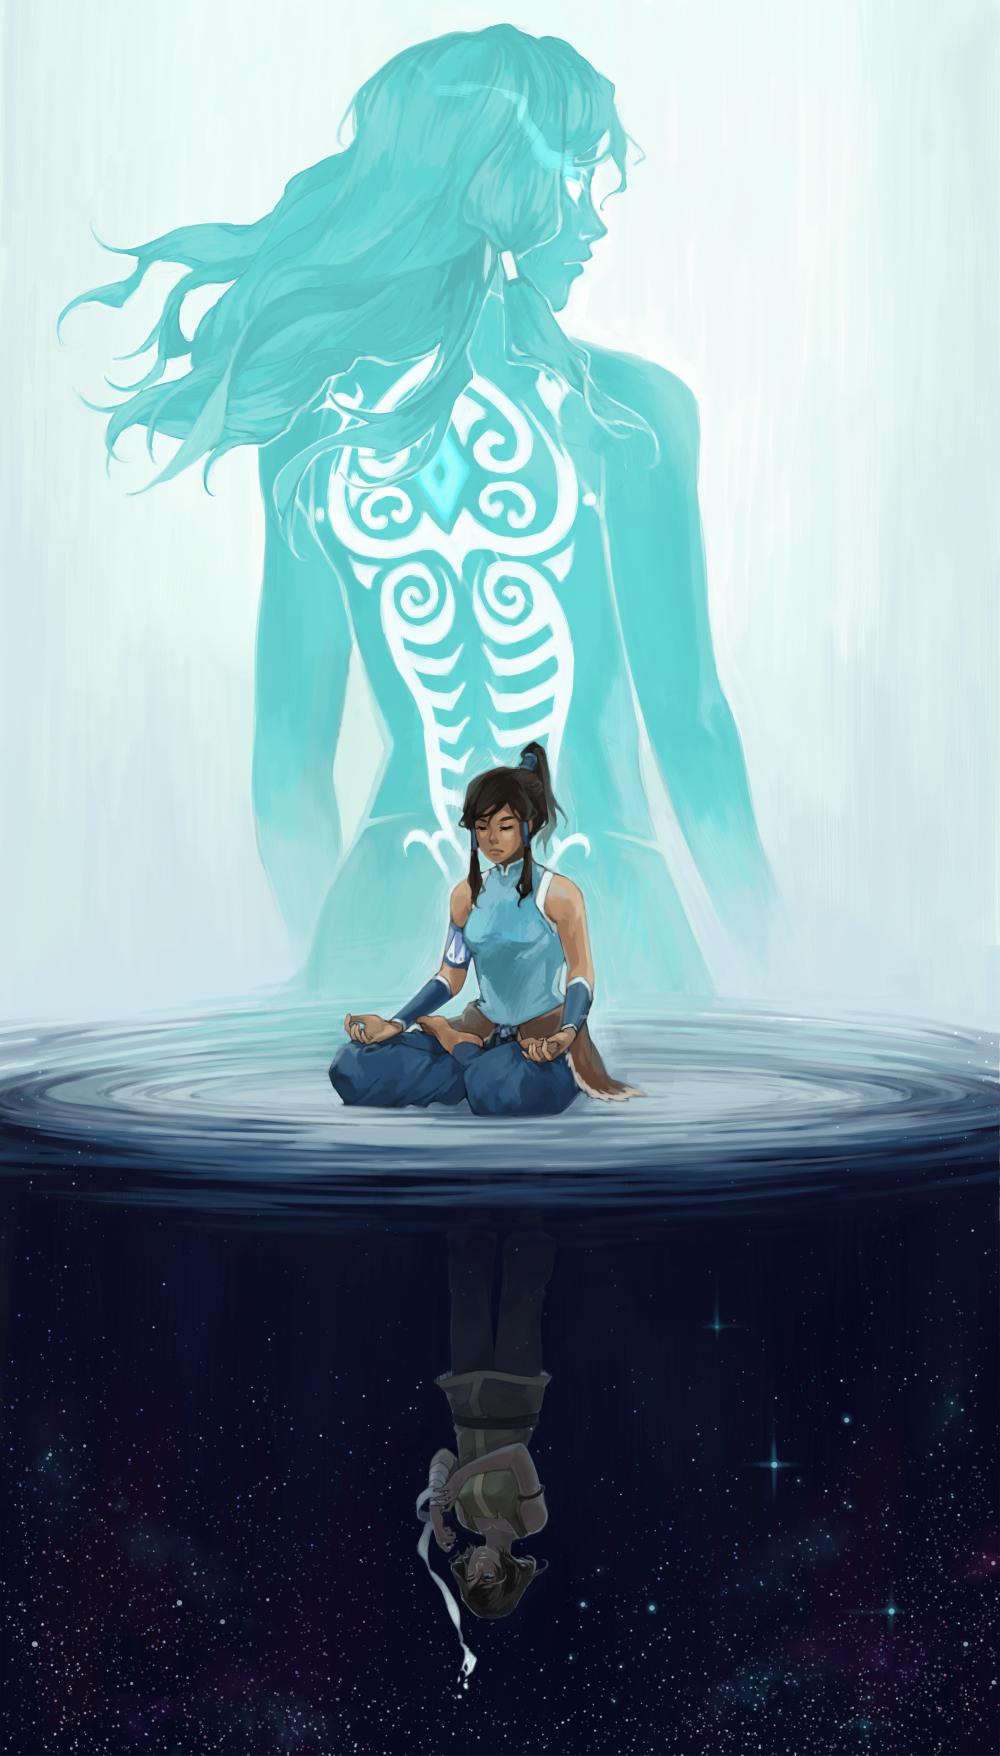 Korra The Legend Of Korra Avatar Amon Tarrlok Wallpaper Rizzle